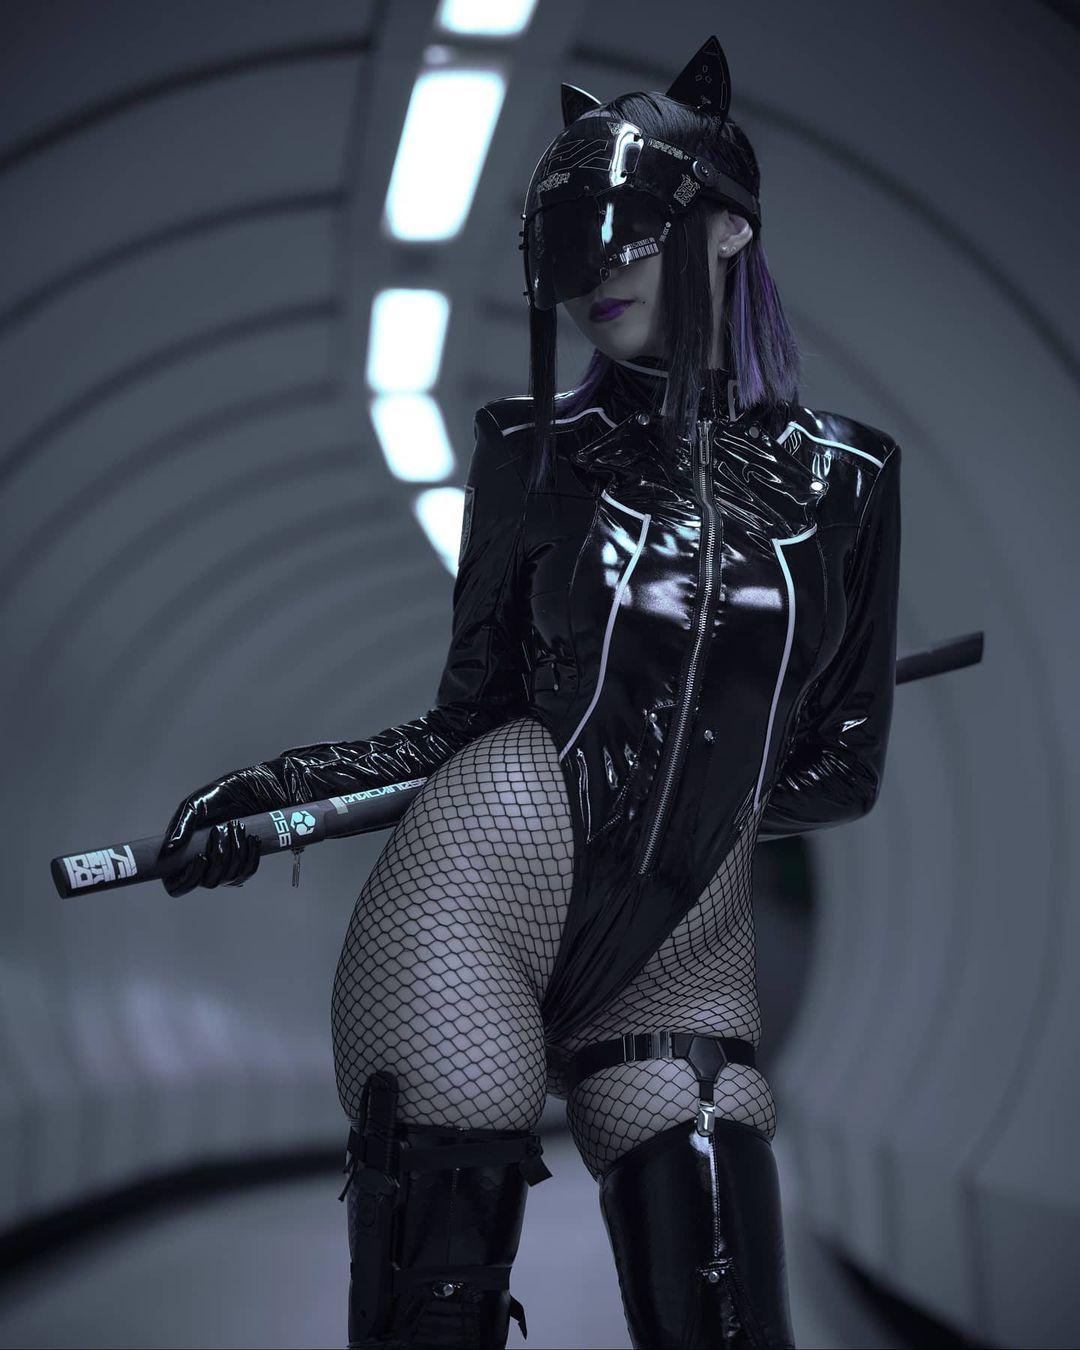 Cyberassassin